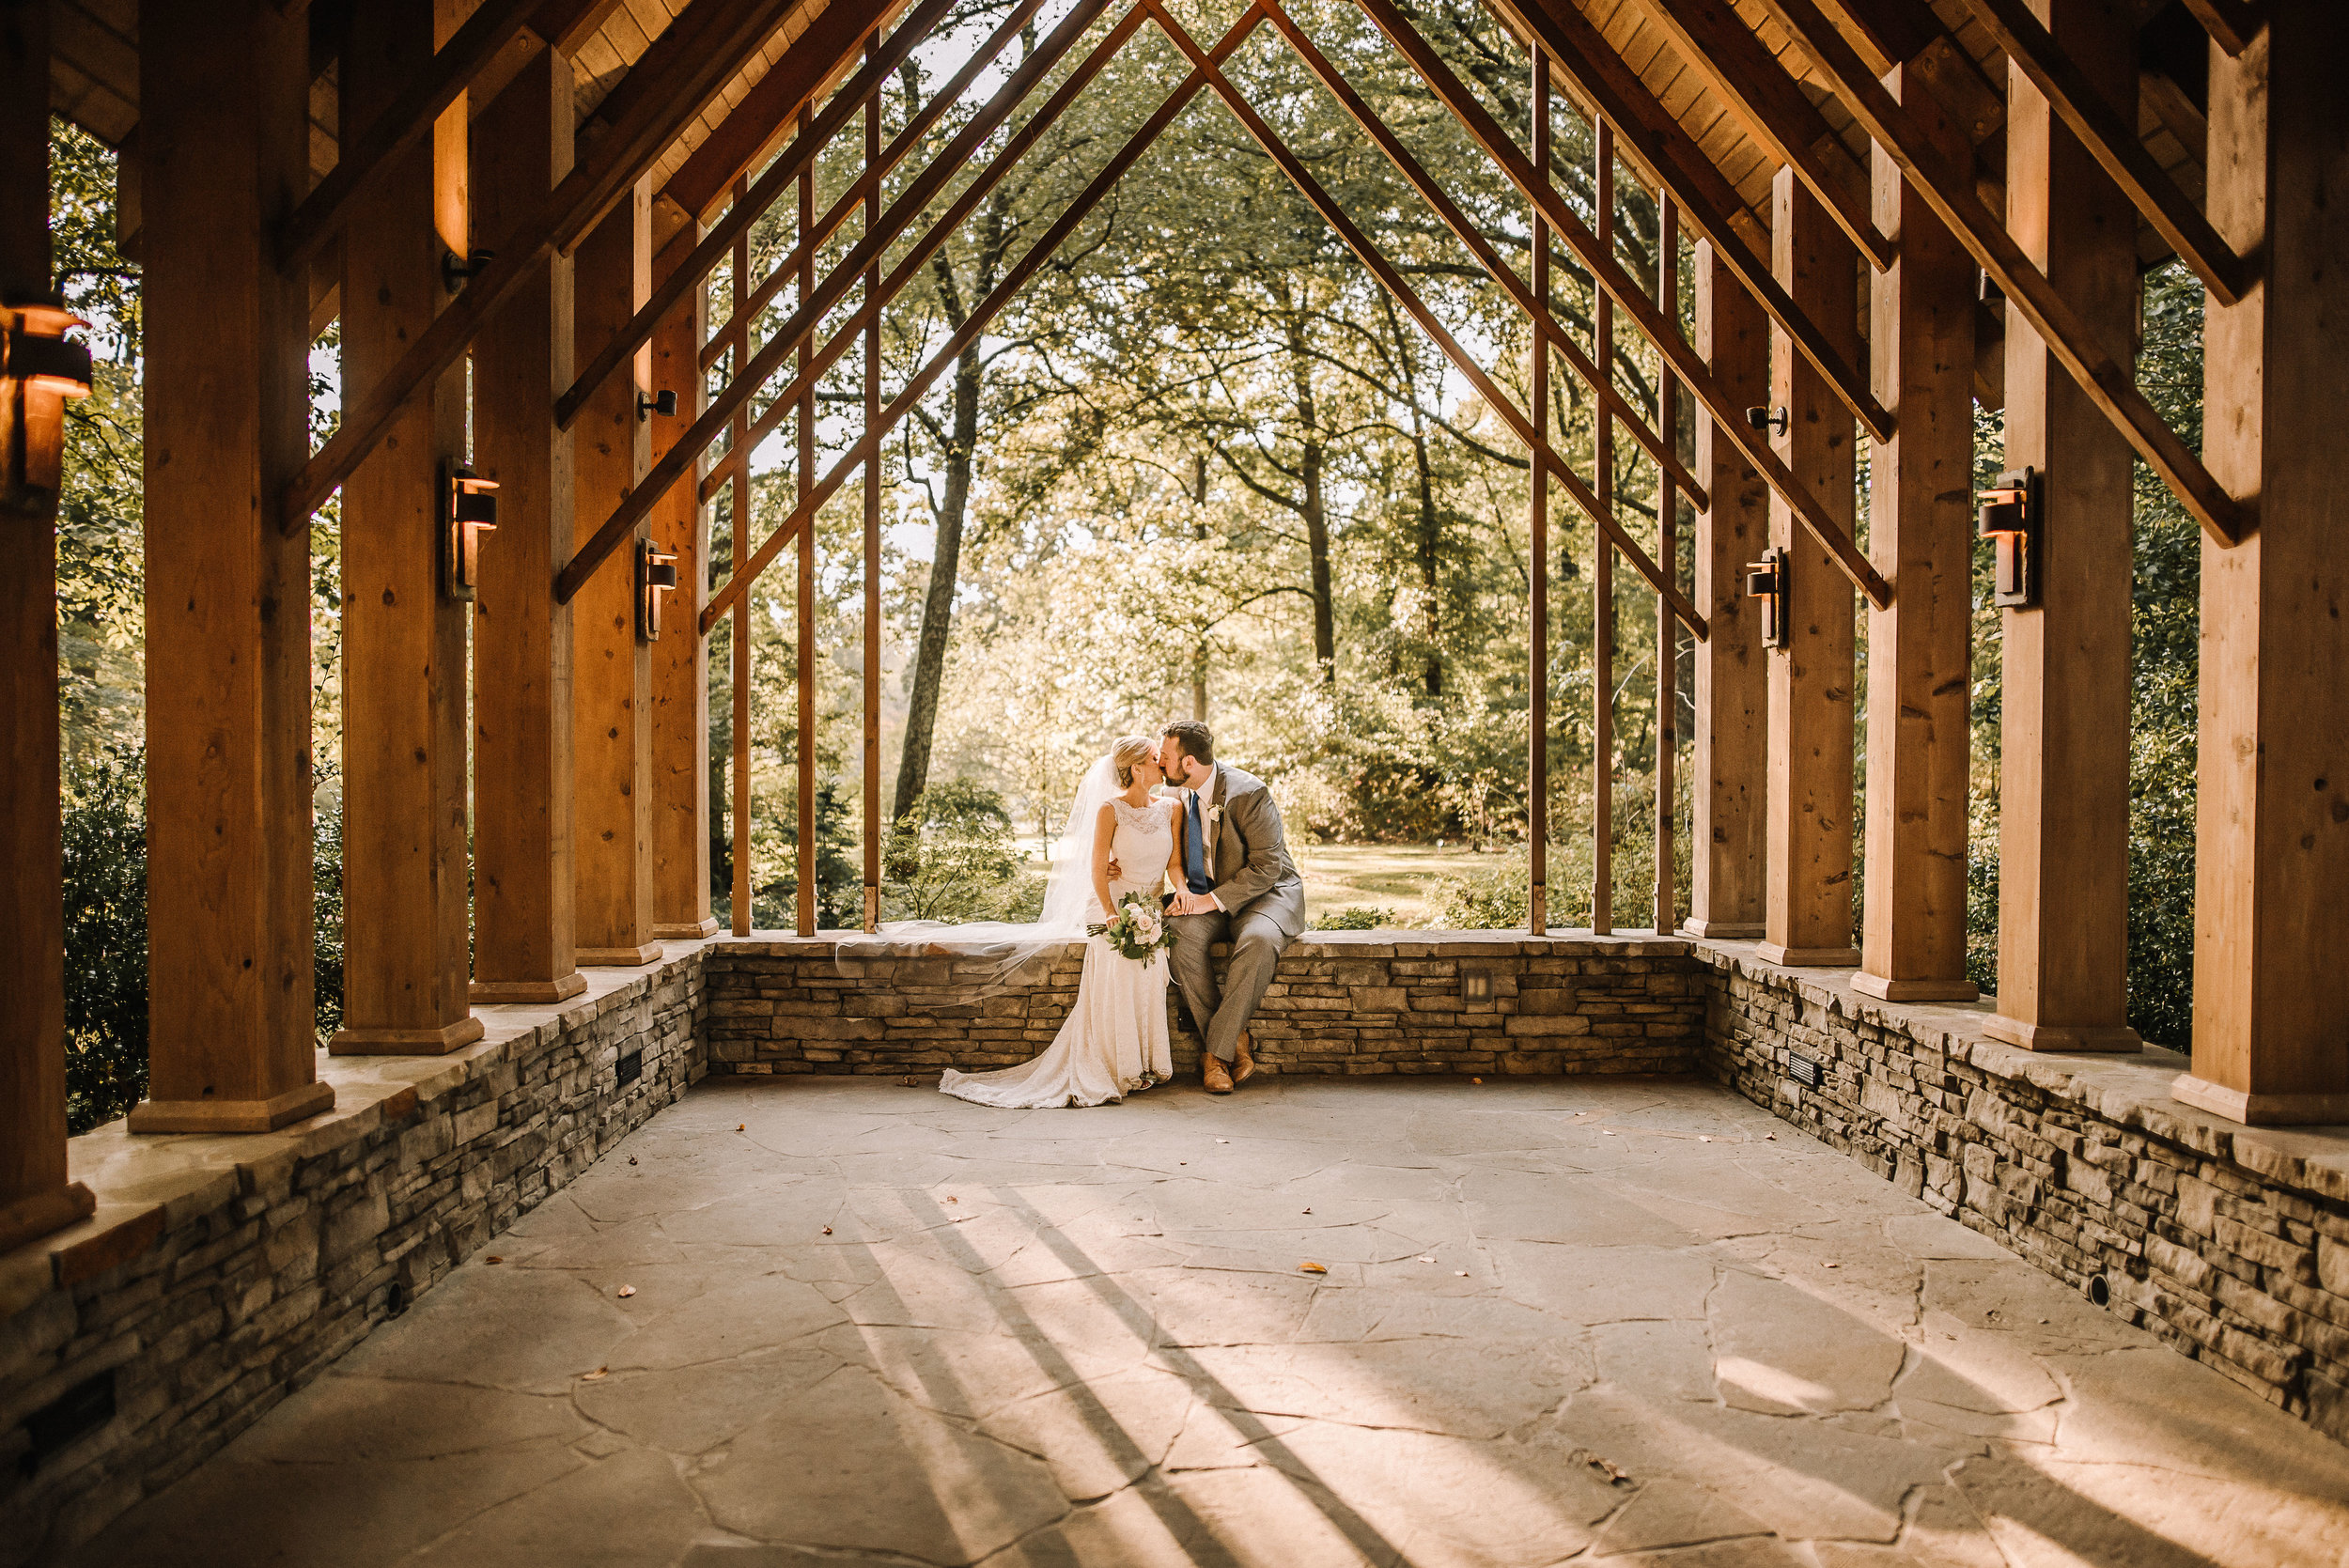 O'Brien-Wedding_Botanic-Gardens_Ashley-Benham-Photography-444.jpg